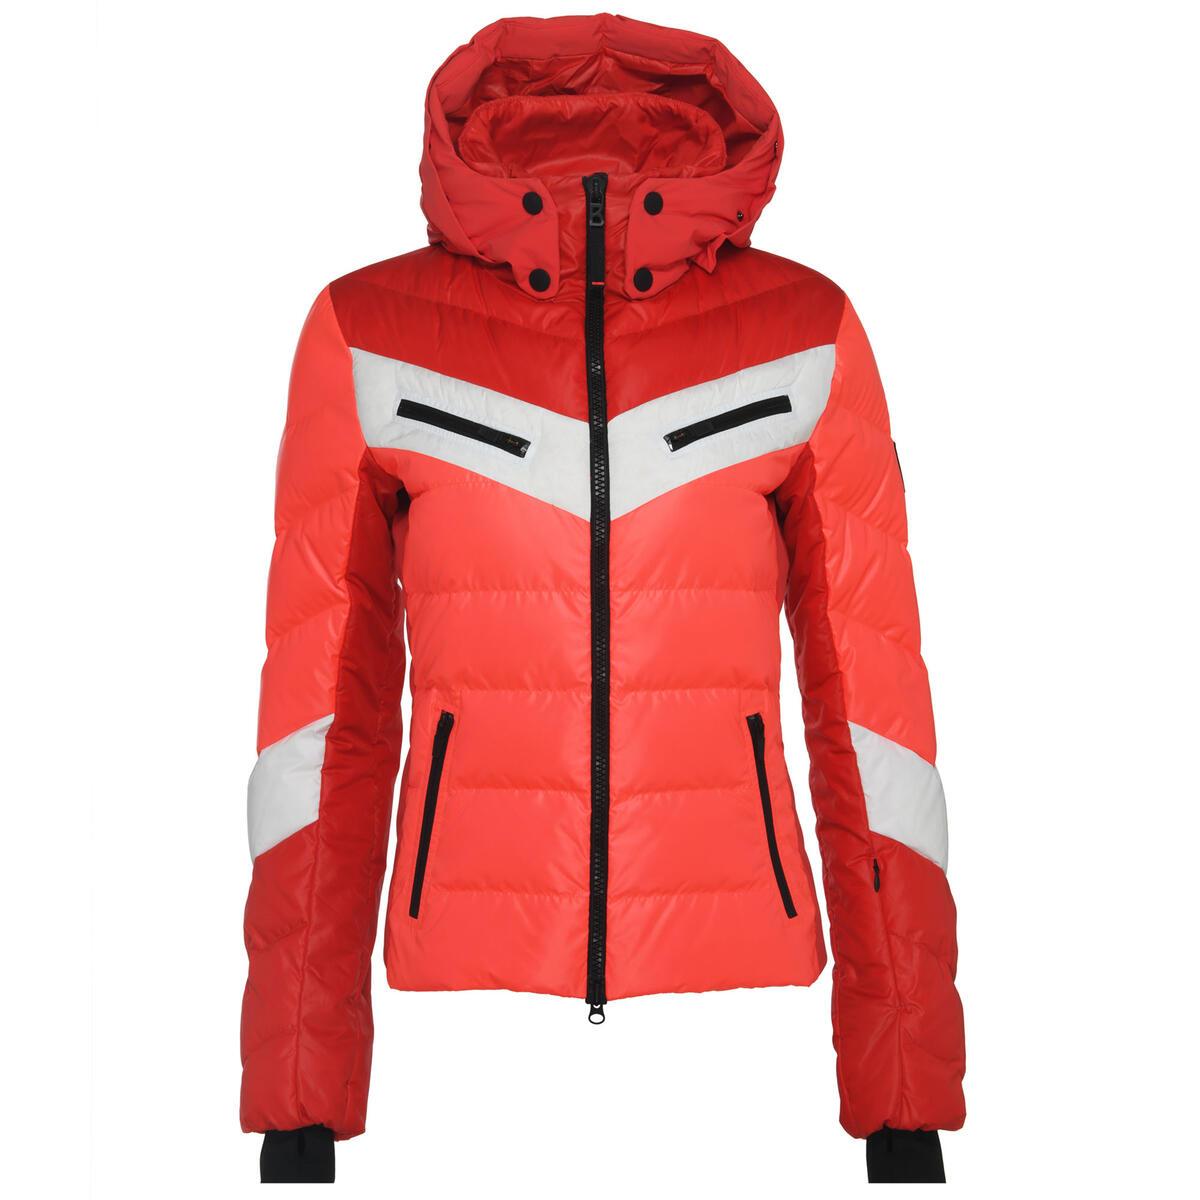 Bogner Fire And Ice Women's Farina D Jacket - Sun & Ski Sports